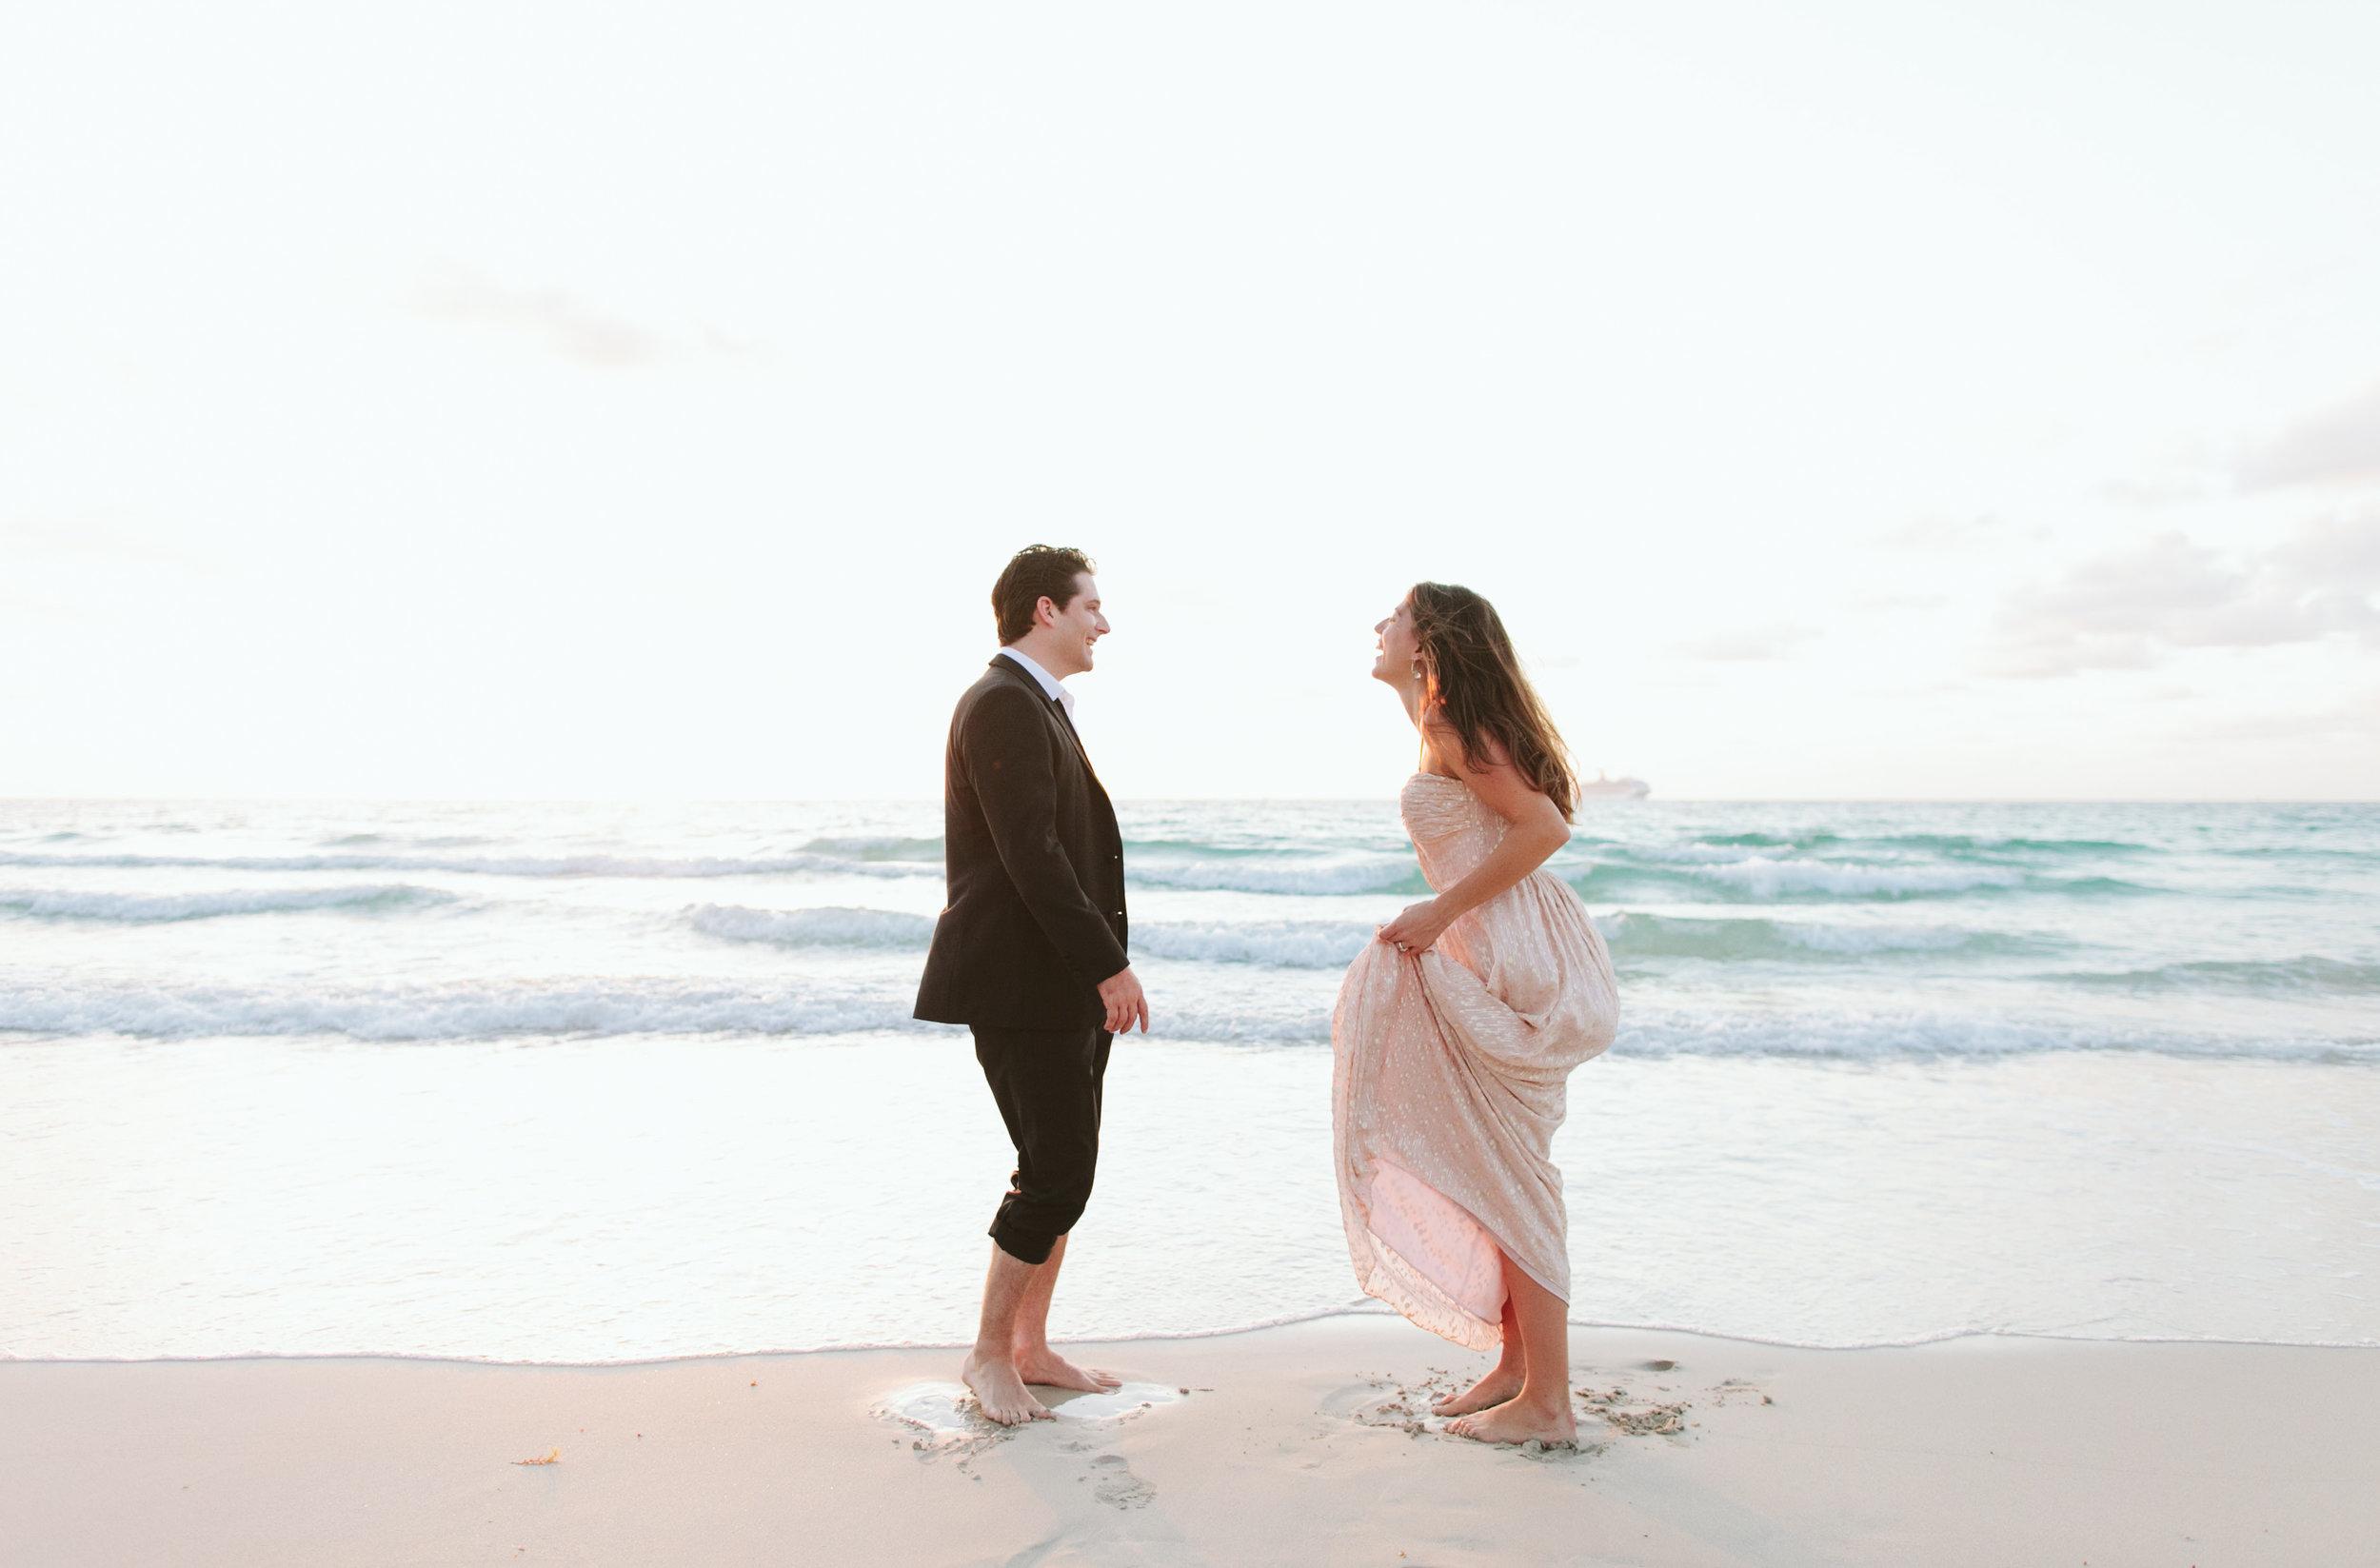 Meli + Mike South Pointe Park South Beach Miami Engagement Shoot18.jpg